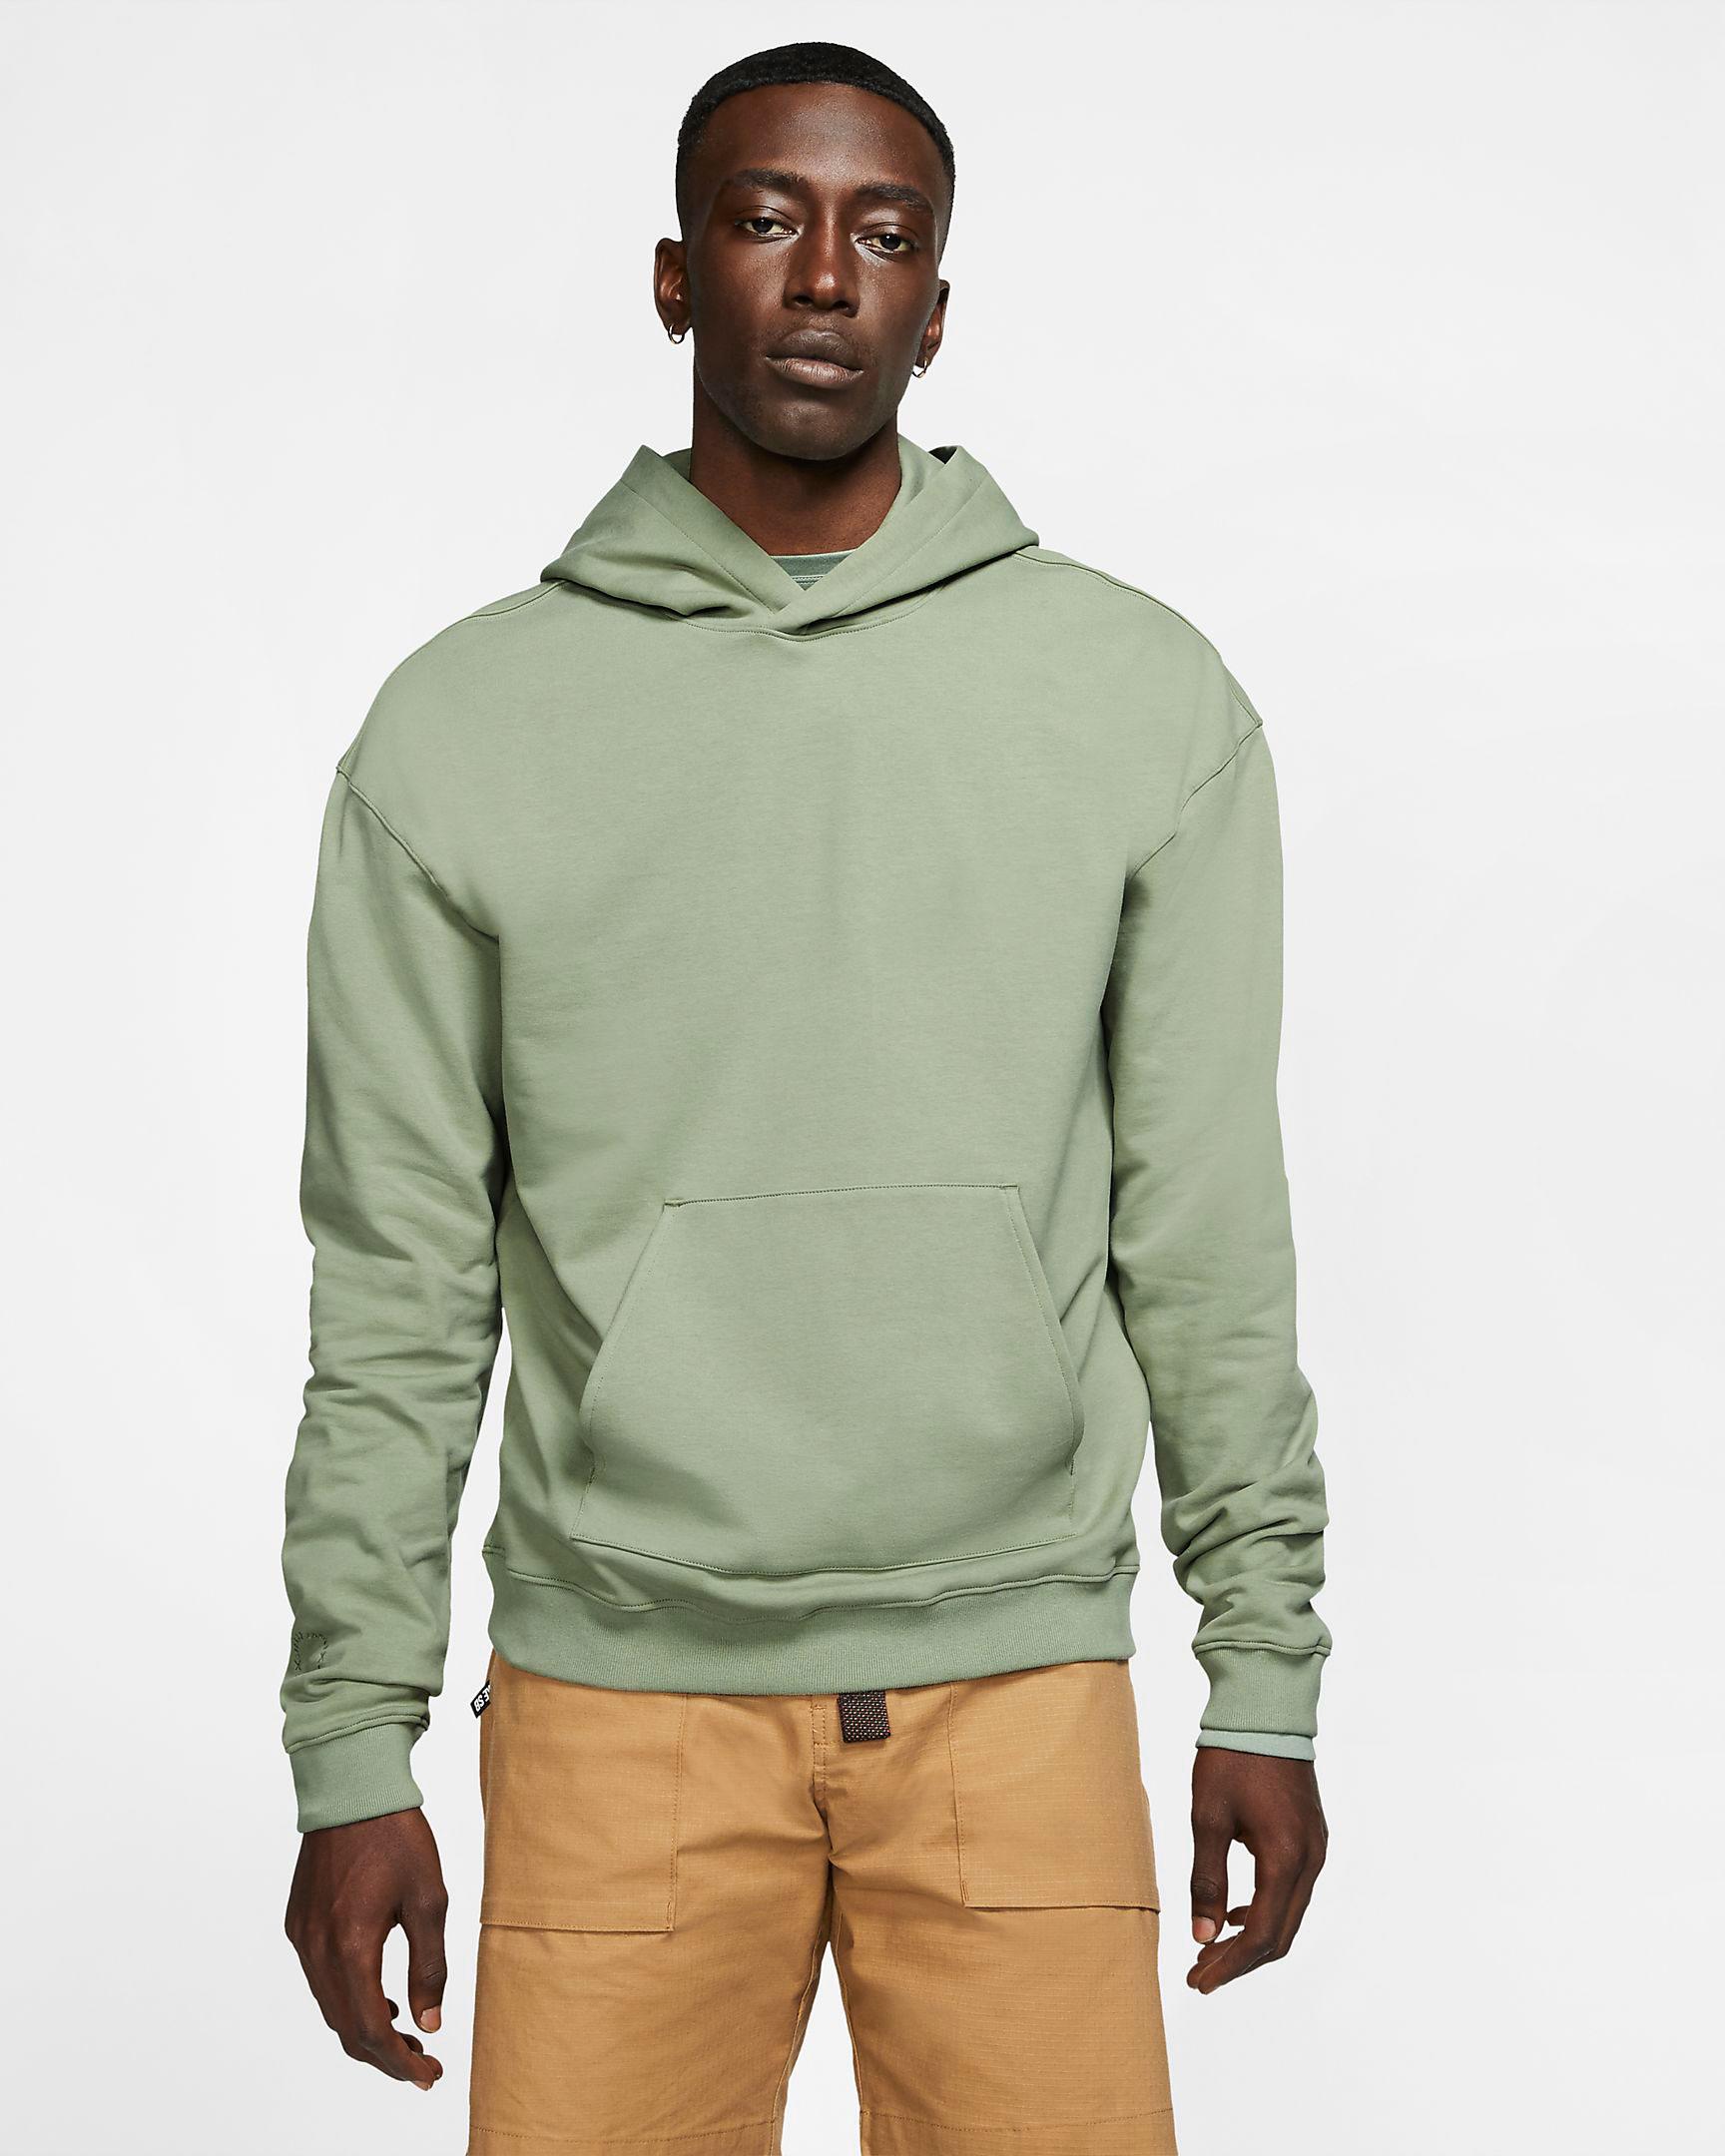 nike-lebron-john-elliott-hoodie-green-1